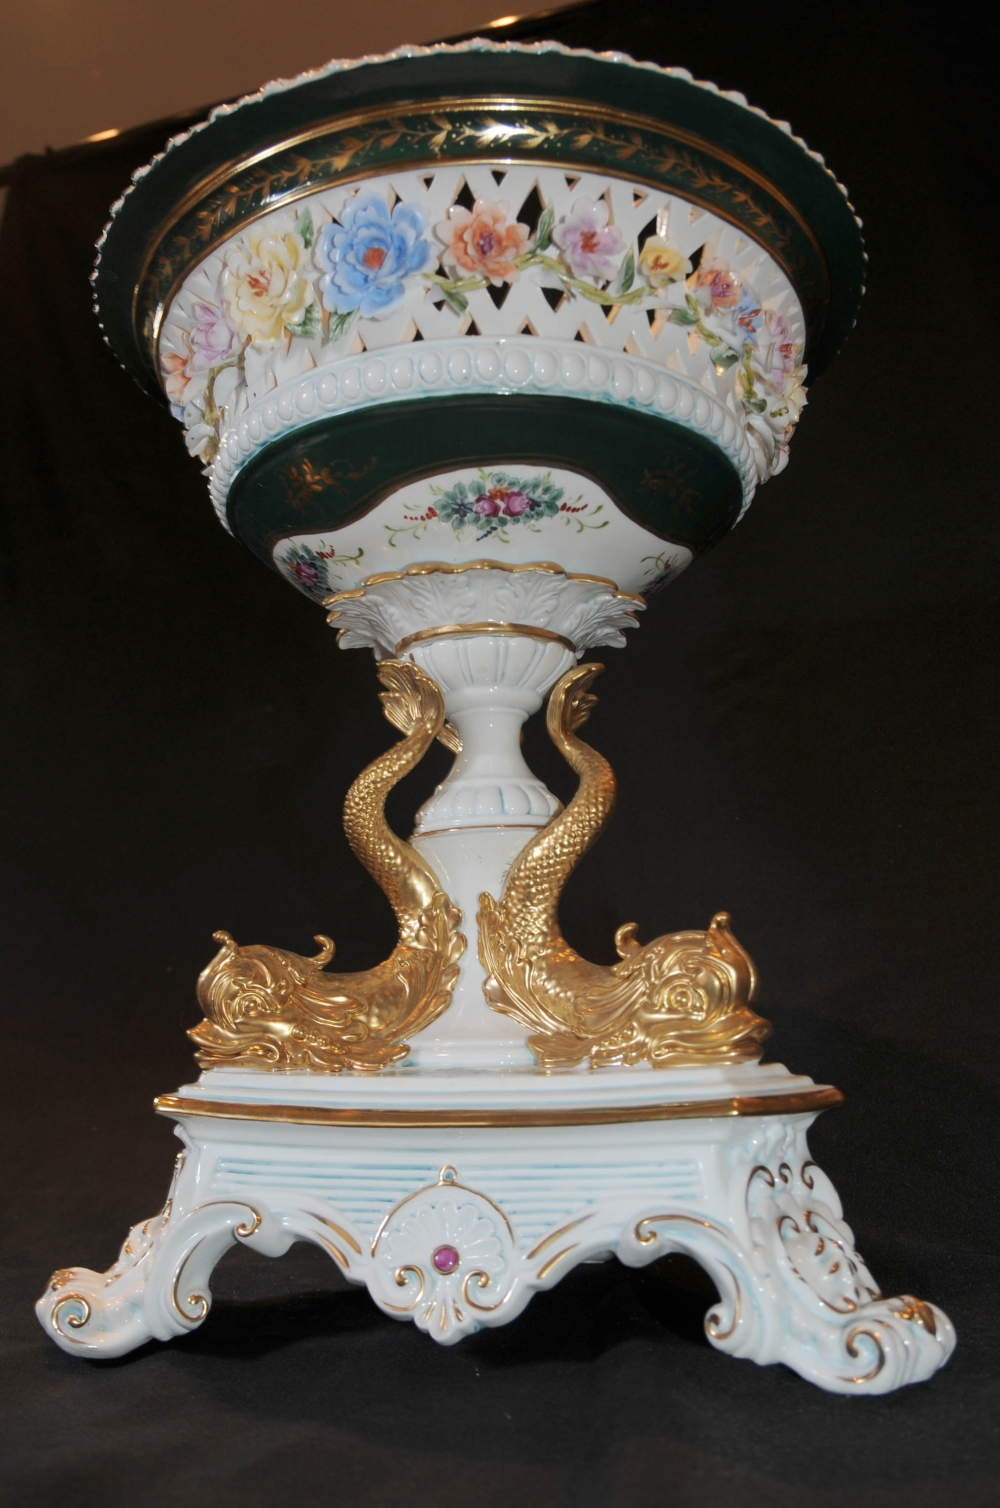 Photo of Dresden Porcelain Gilt Serpent Comport Bowl Stand